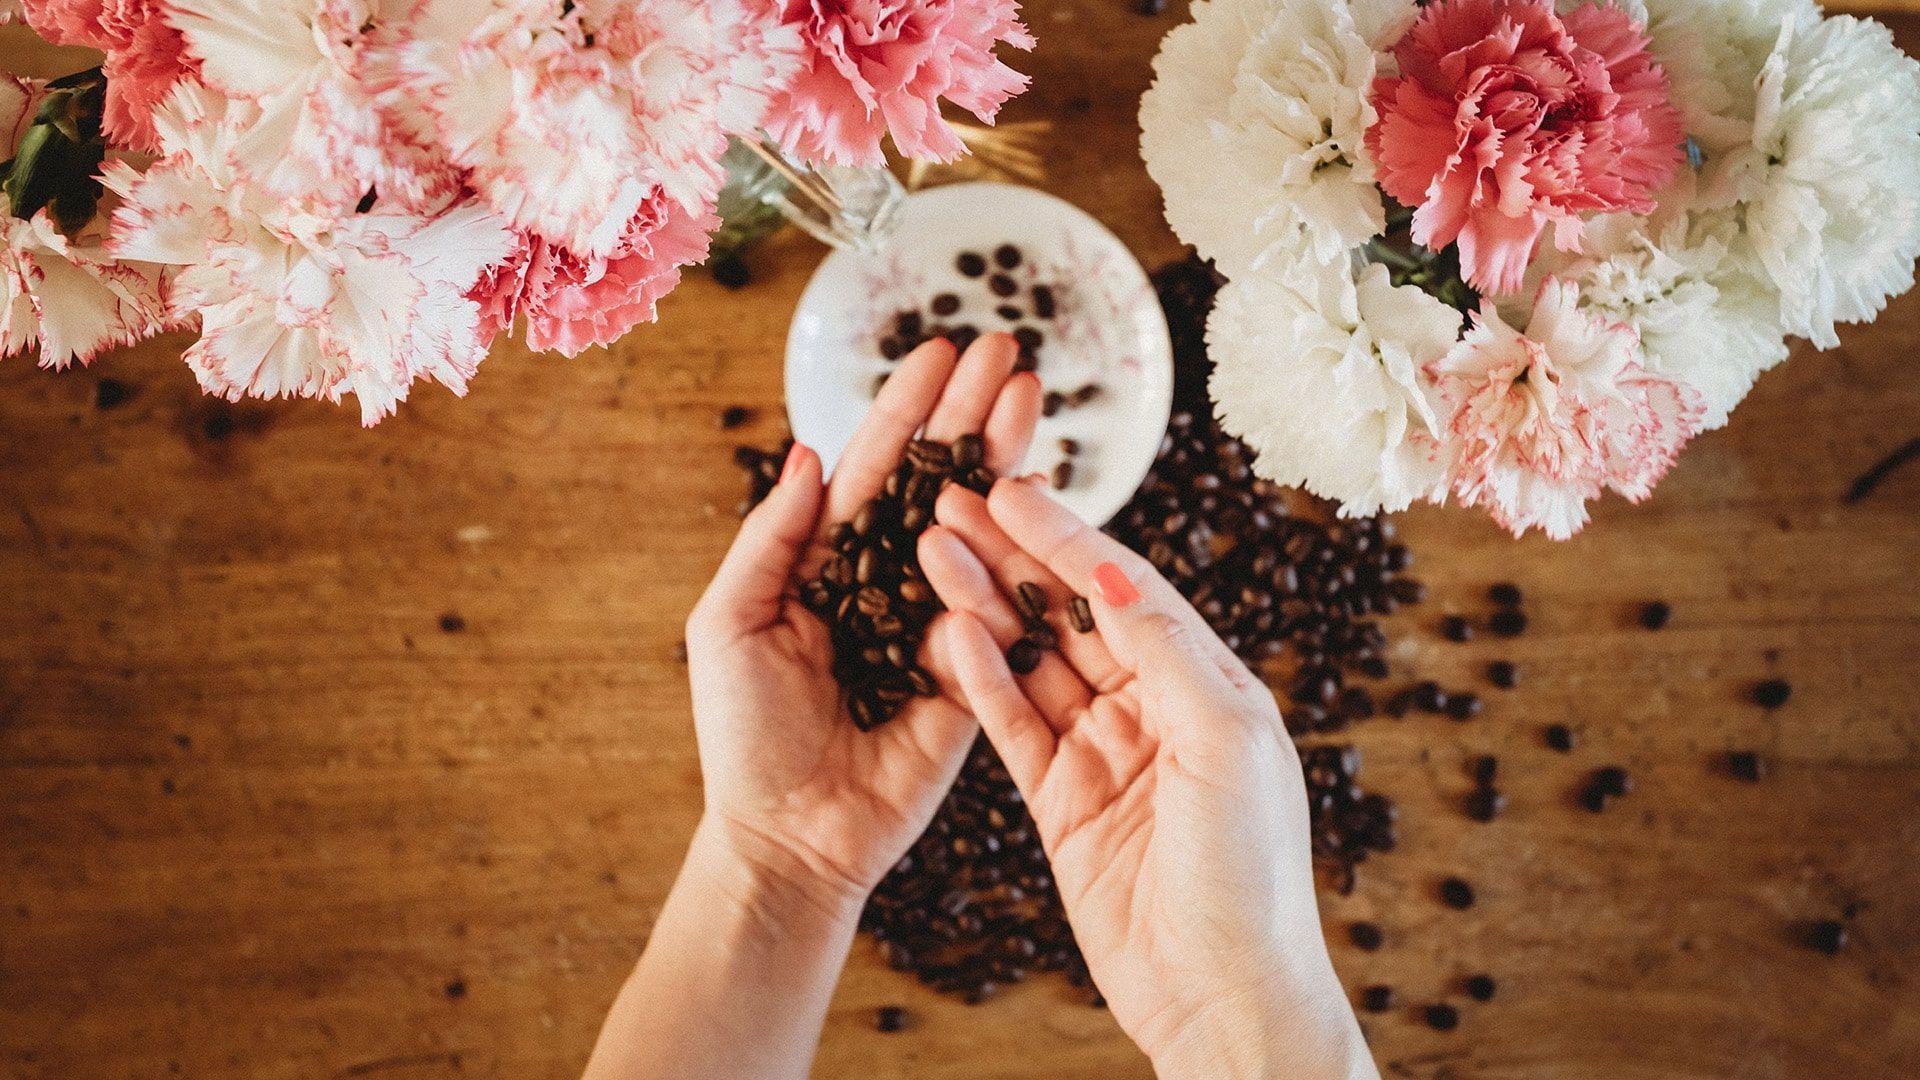 Entra nel mondo di Caffè Vergnano